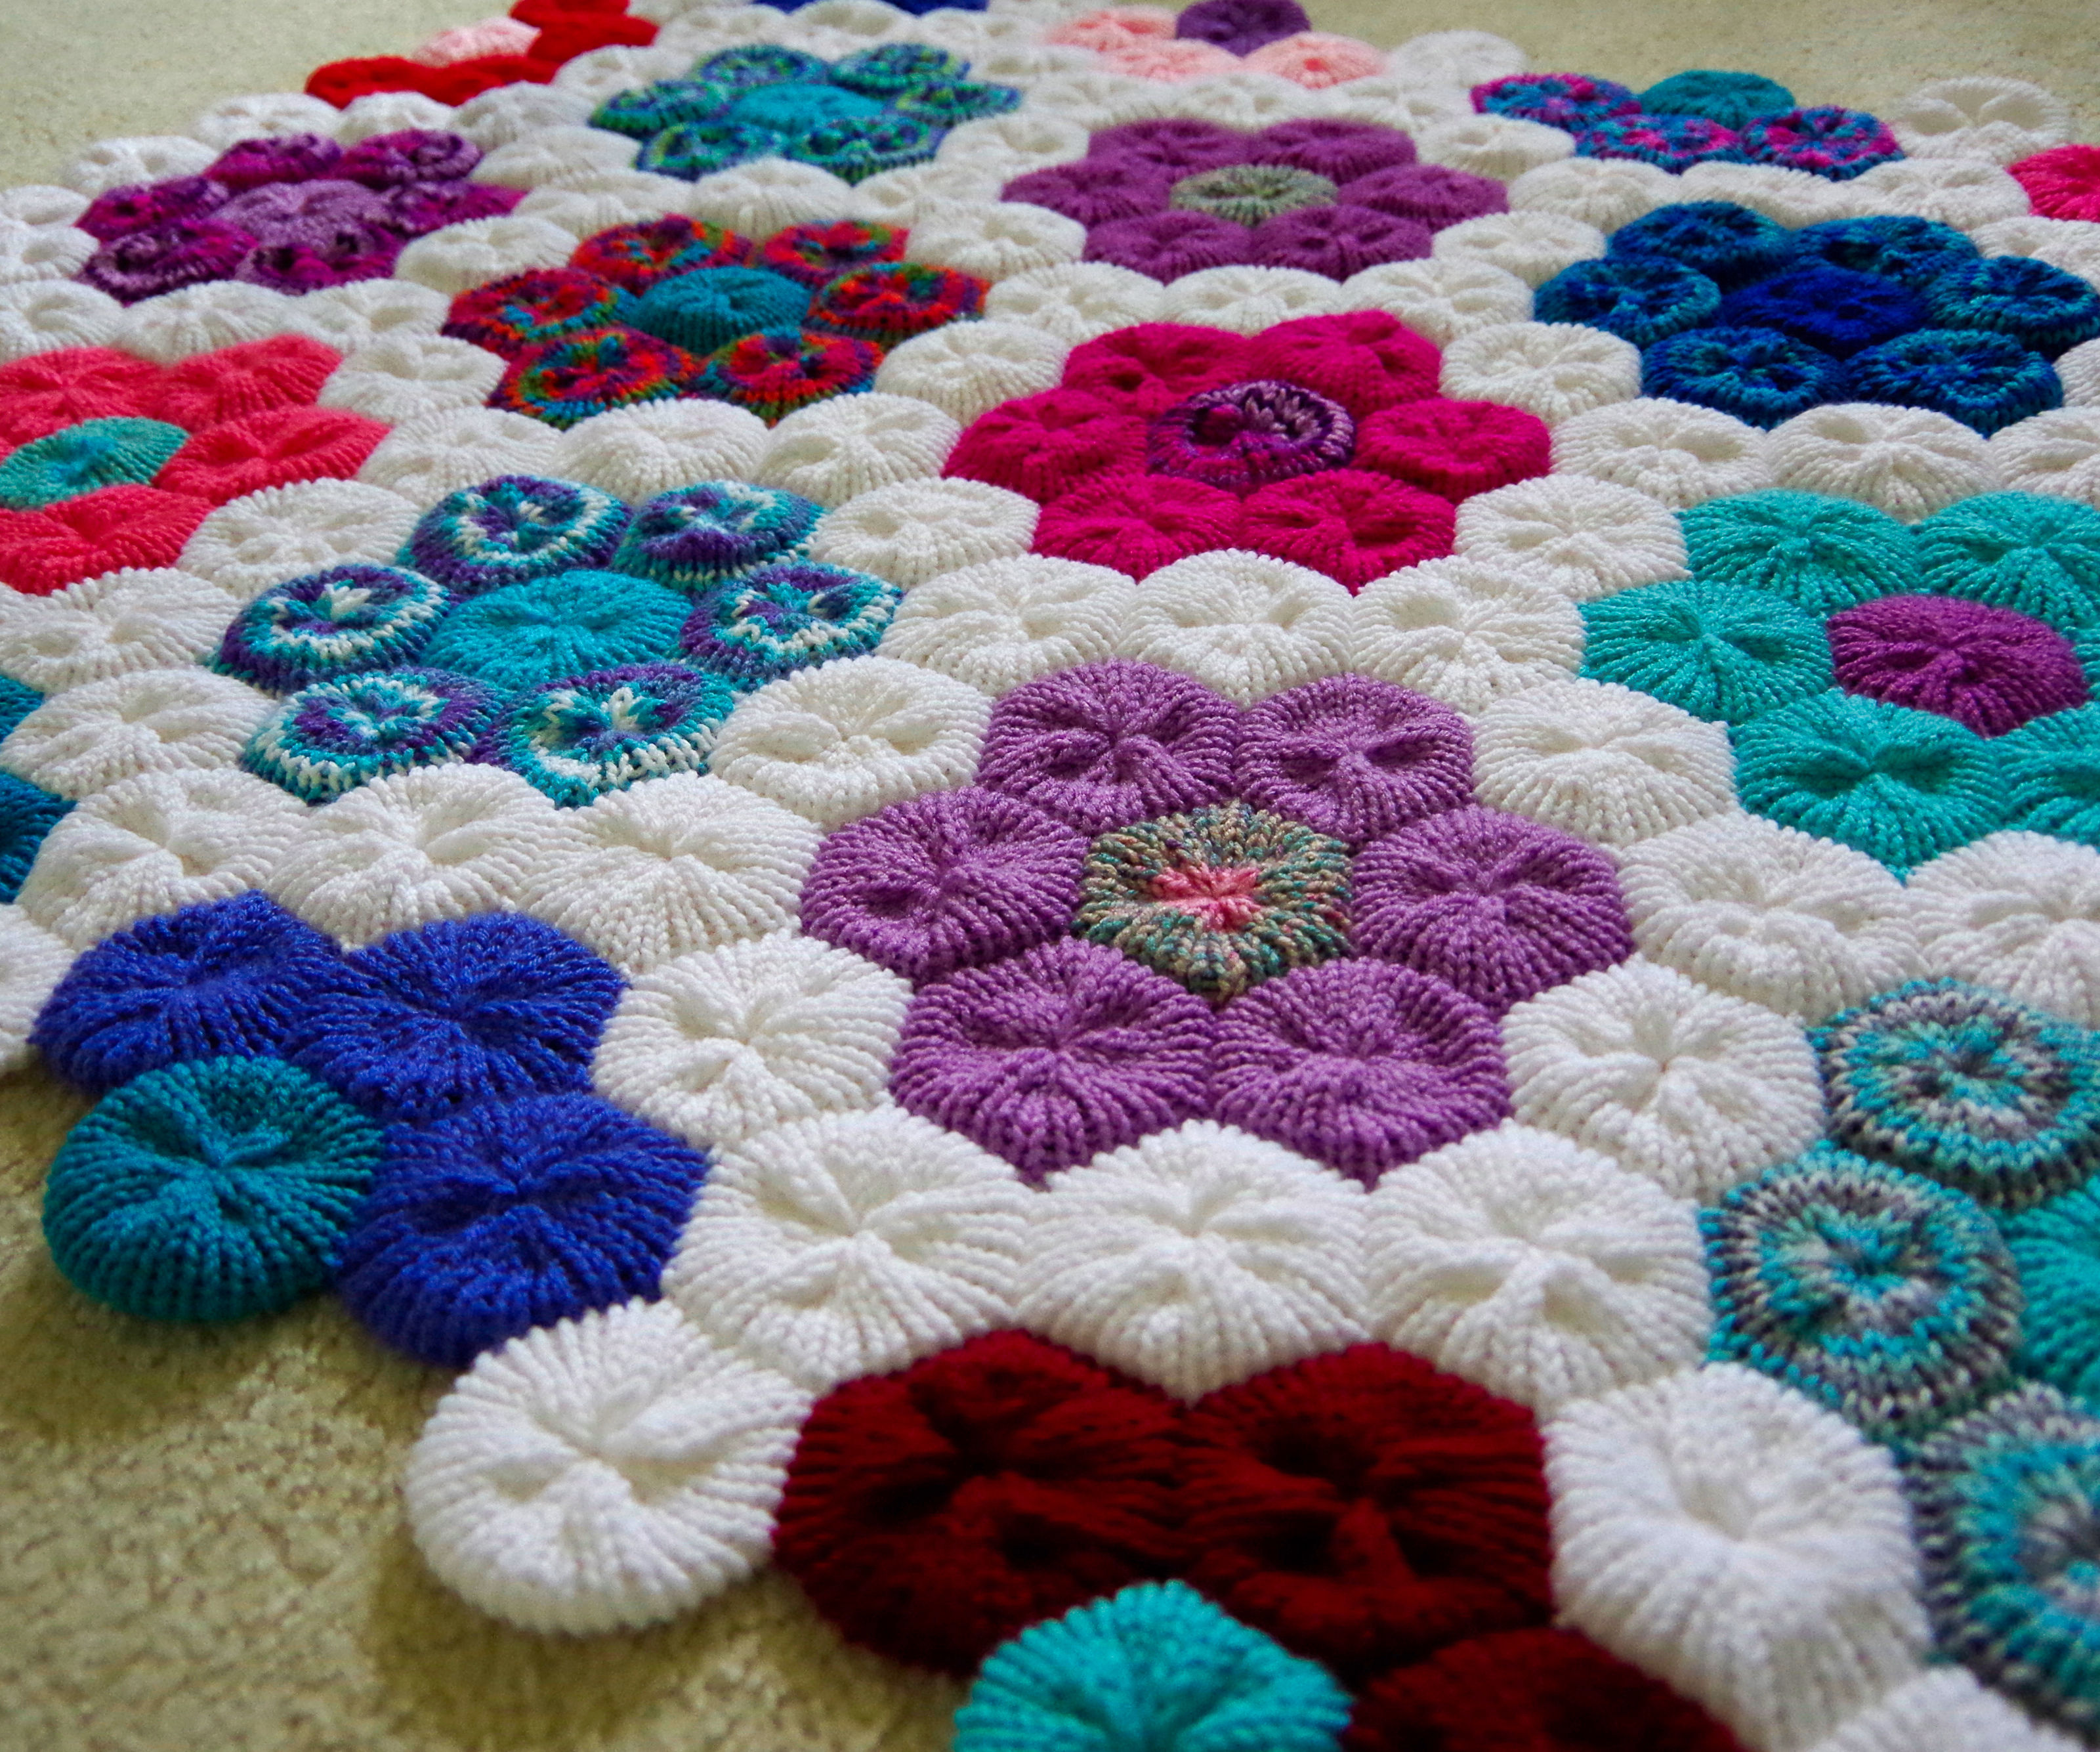 Hexagon Flower Afghan or Rug